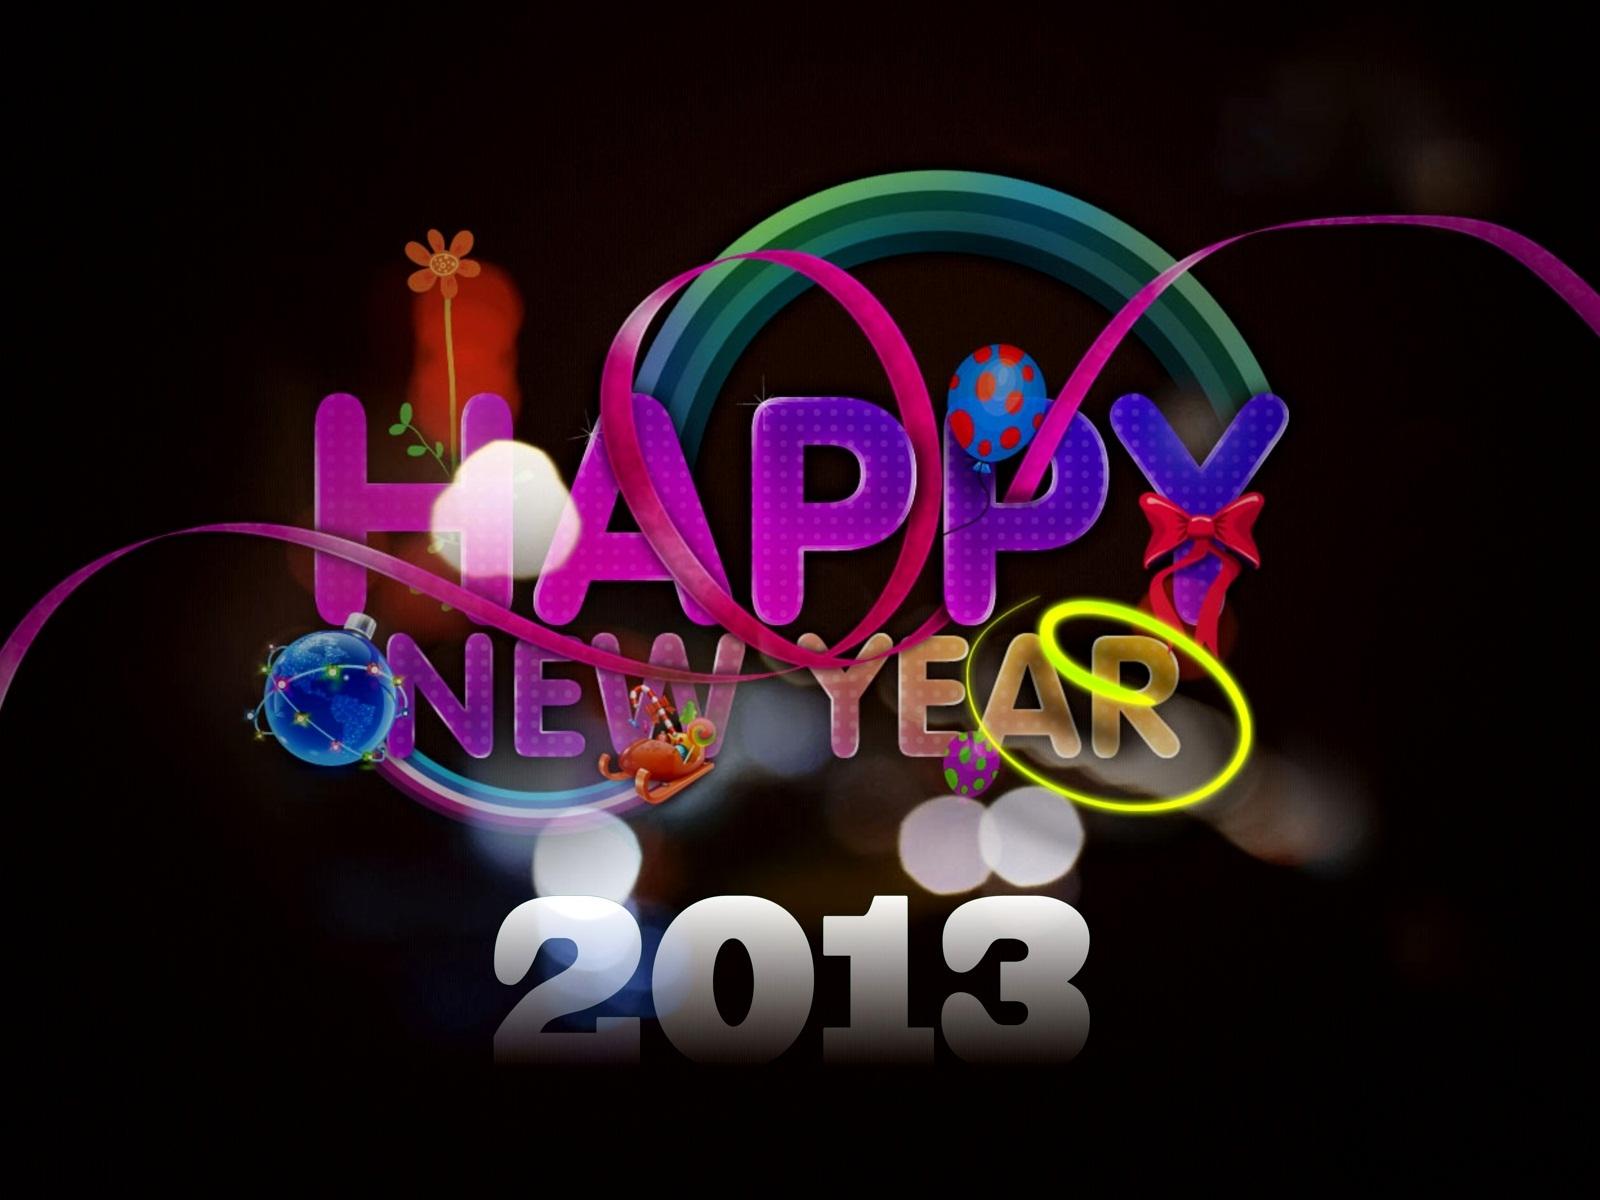 http://2.bp.blogspot.com/-C2h1hRn_6x4/UN79I3cTKQI/AAAAAAAAEDc/ng0QvhAmT74/s1600/2013-new-year-hd-wallpaper-4.jpg